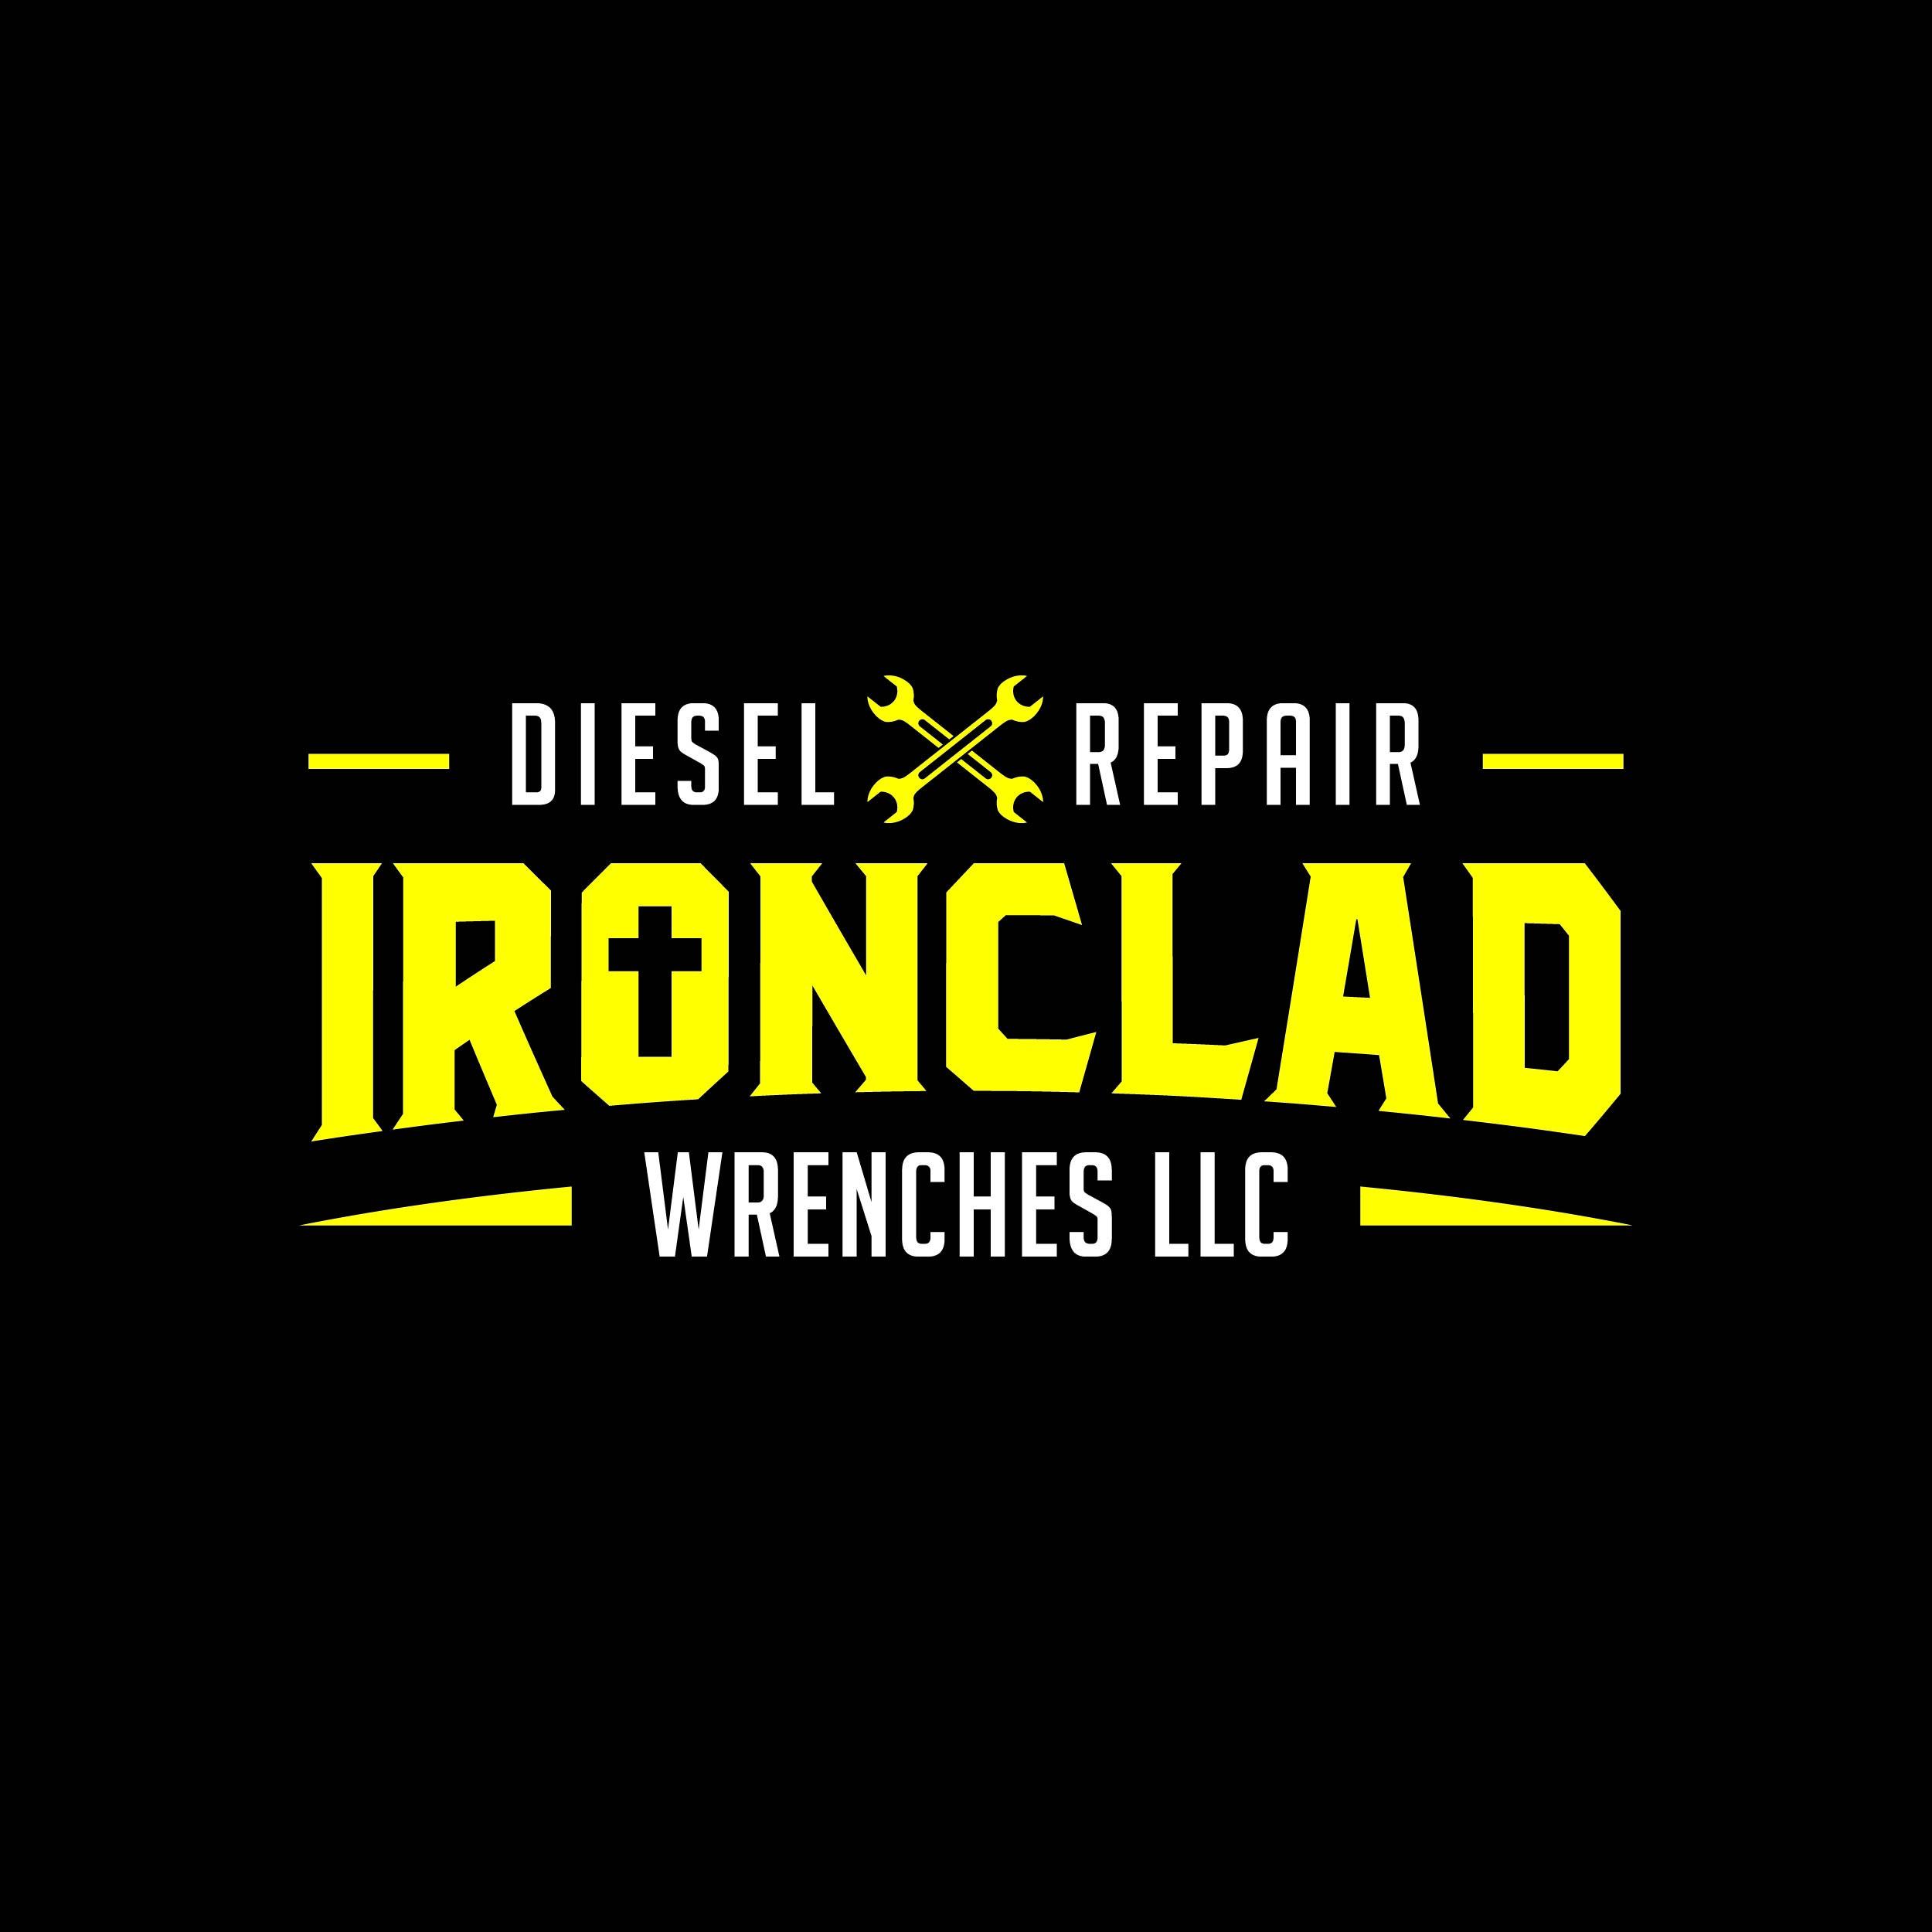 Ironclad Wrenches LLC, Diesel Repair Shop Logo